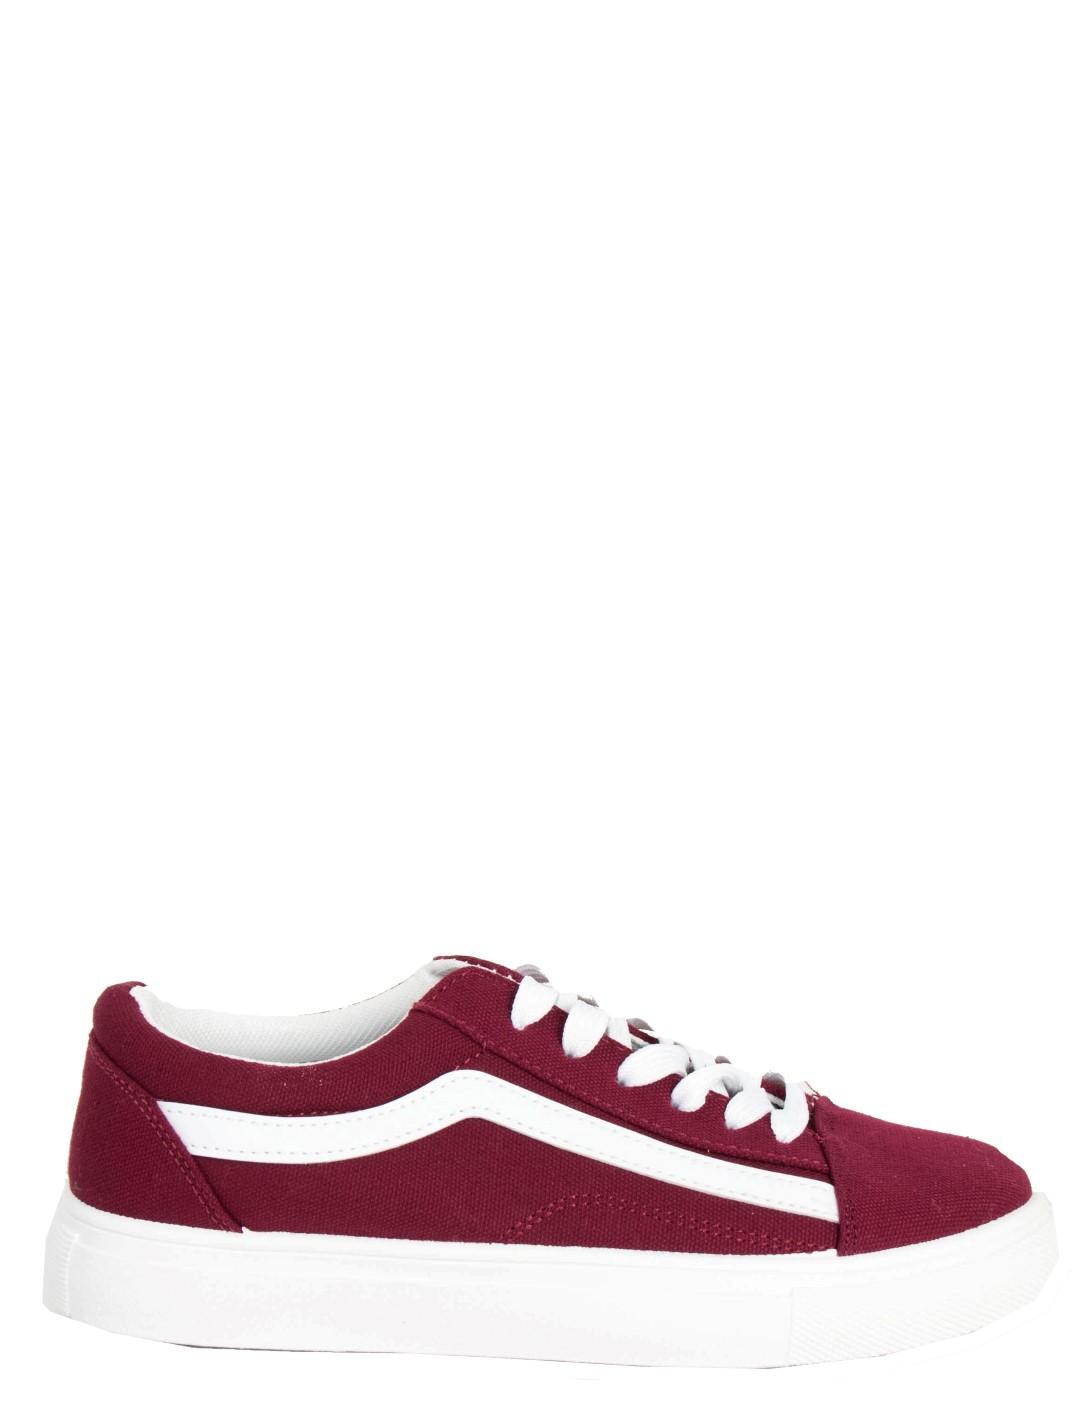 Huxley   Grace Γυναικεία μπορντό πάνινα Sneakers με διχρωμία M622Q. Huxley    Grace Γυναικεία μπορντό πάνινα Sneakers με διχρωμία M622Q 59d0fea51d6